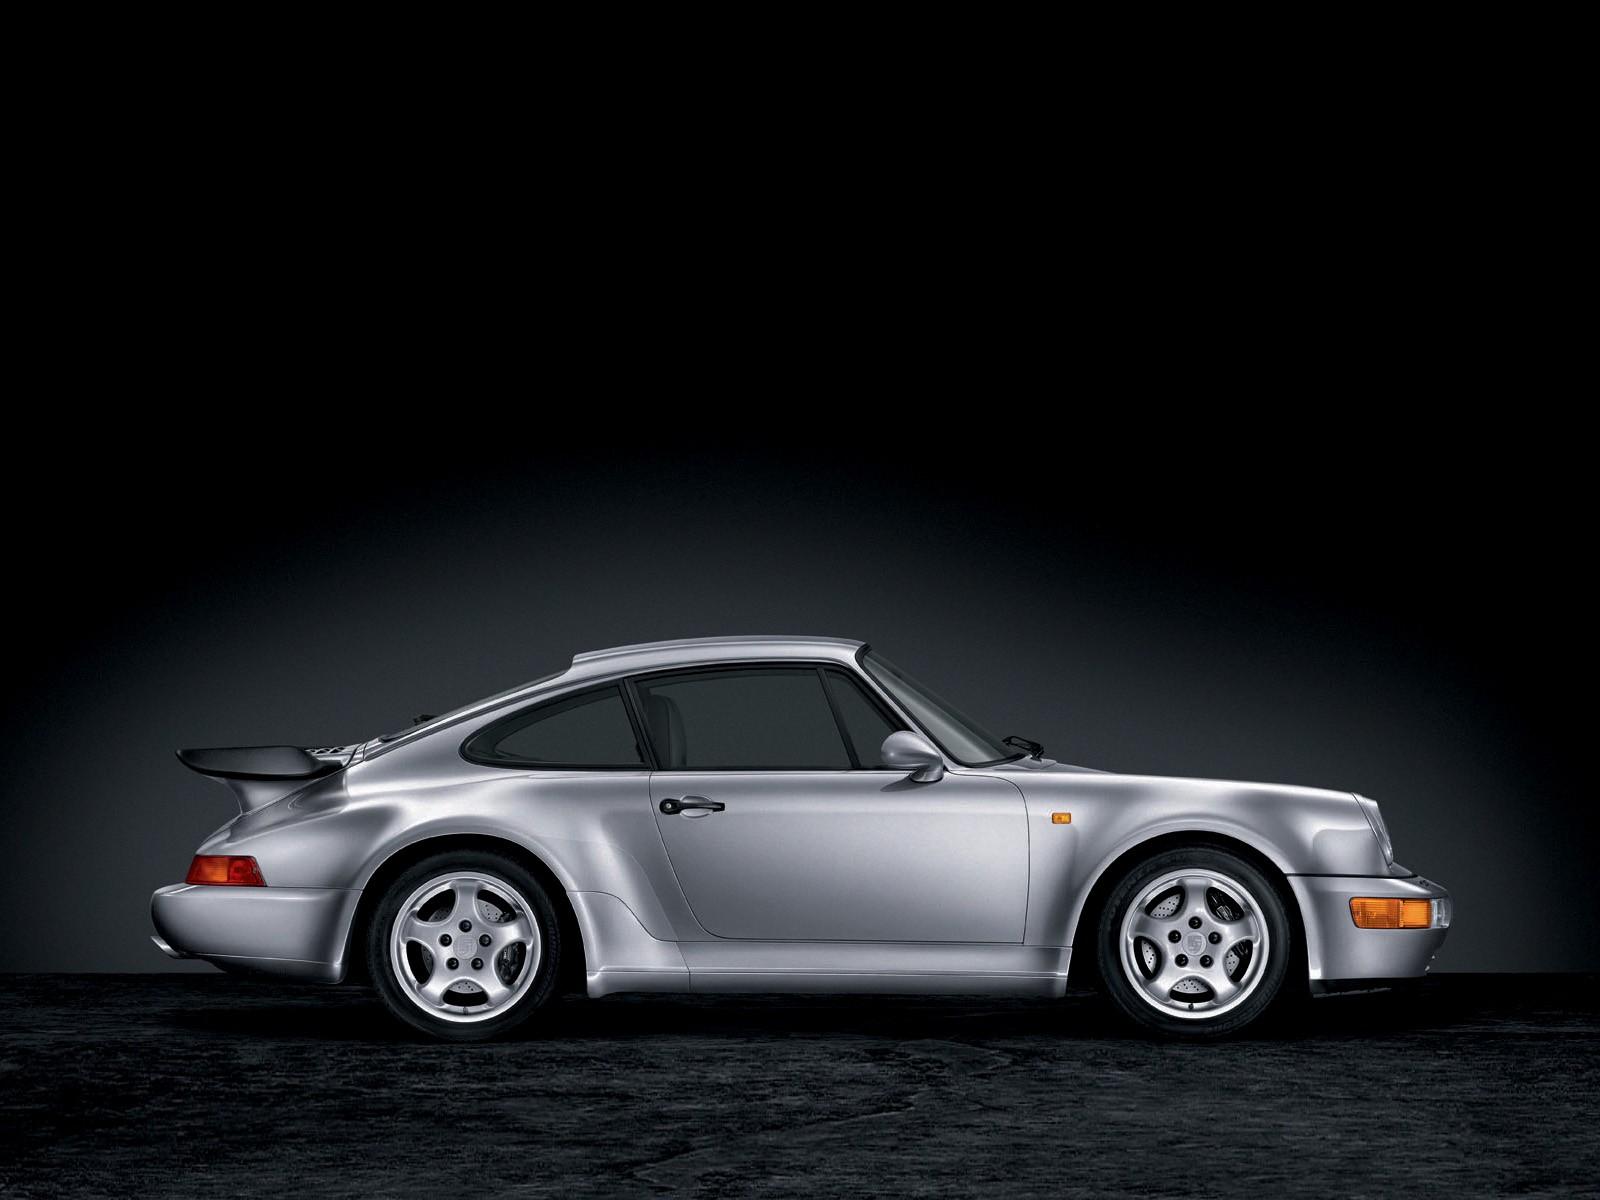 Porsche 911 Turbo 964 Specs Photos 1990 1991 1992 1993 930 Twin Turbos 1995